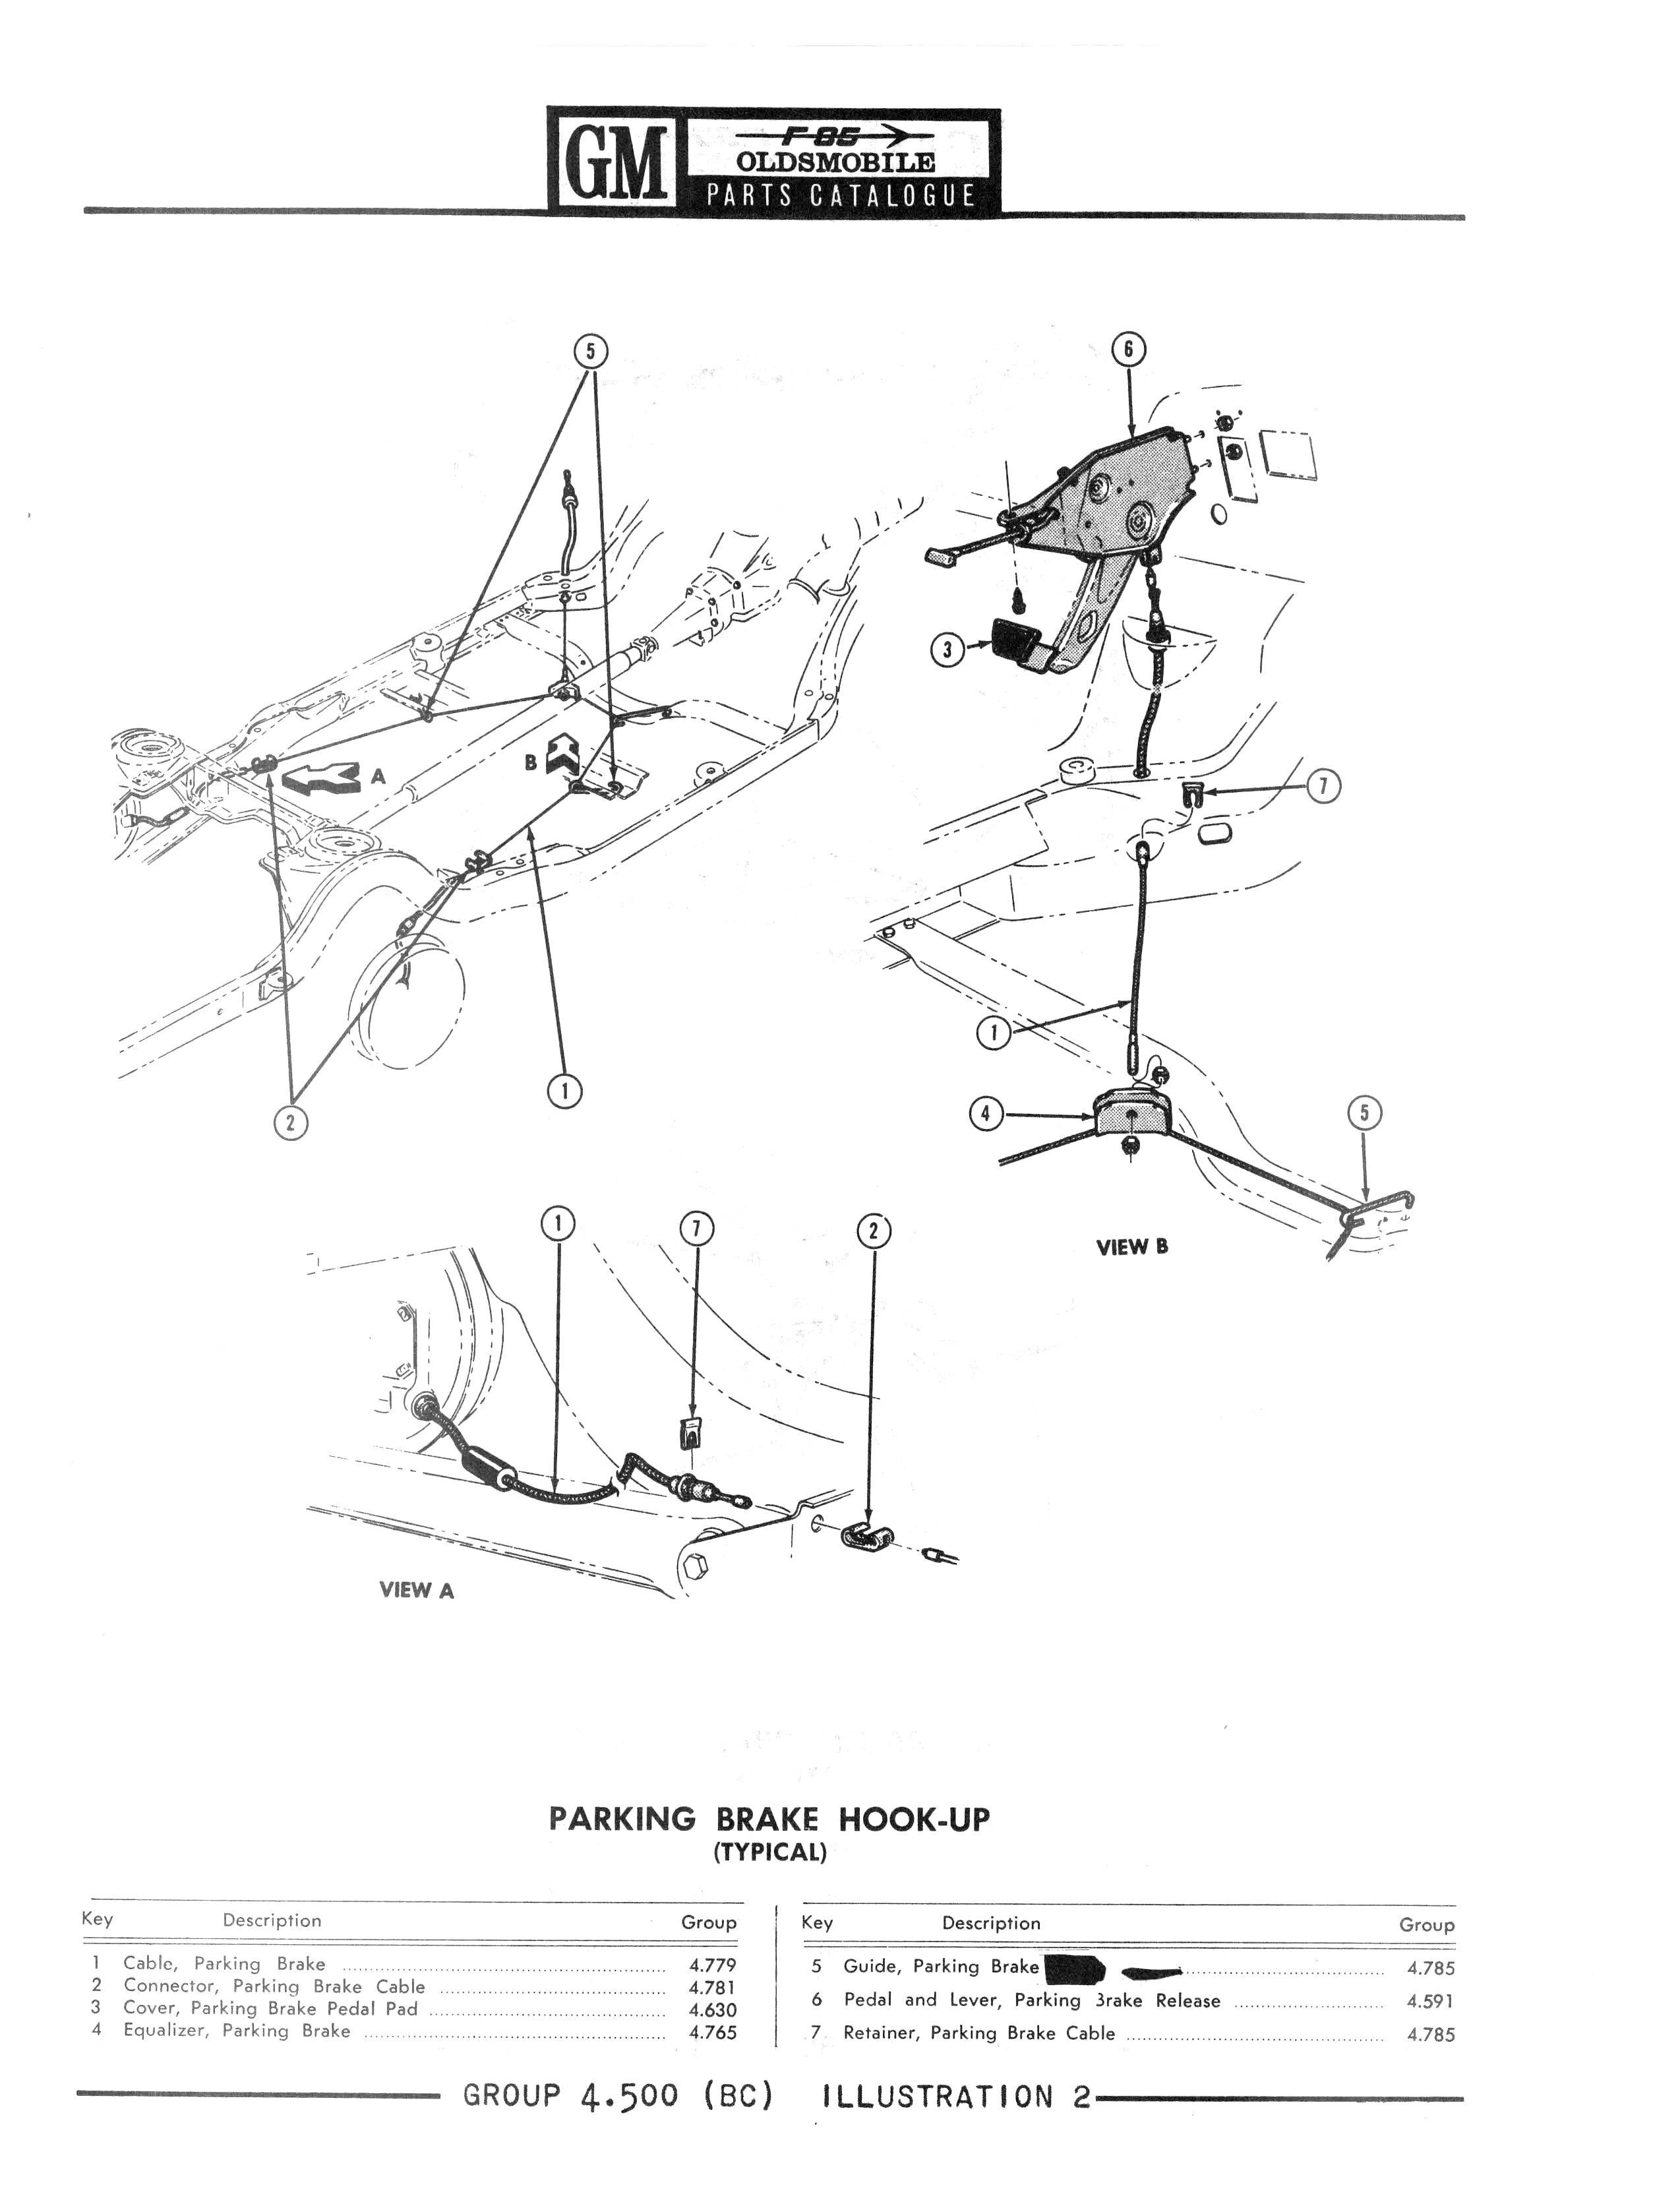 64-76 olds F-85 Cutlass Parts Manual / F85-Yellow0536.jpg